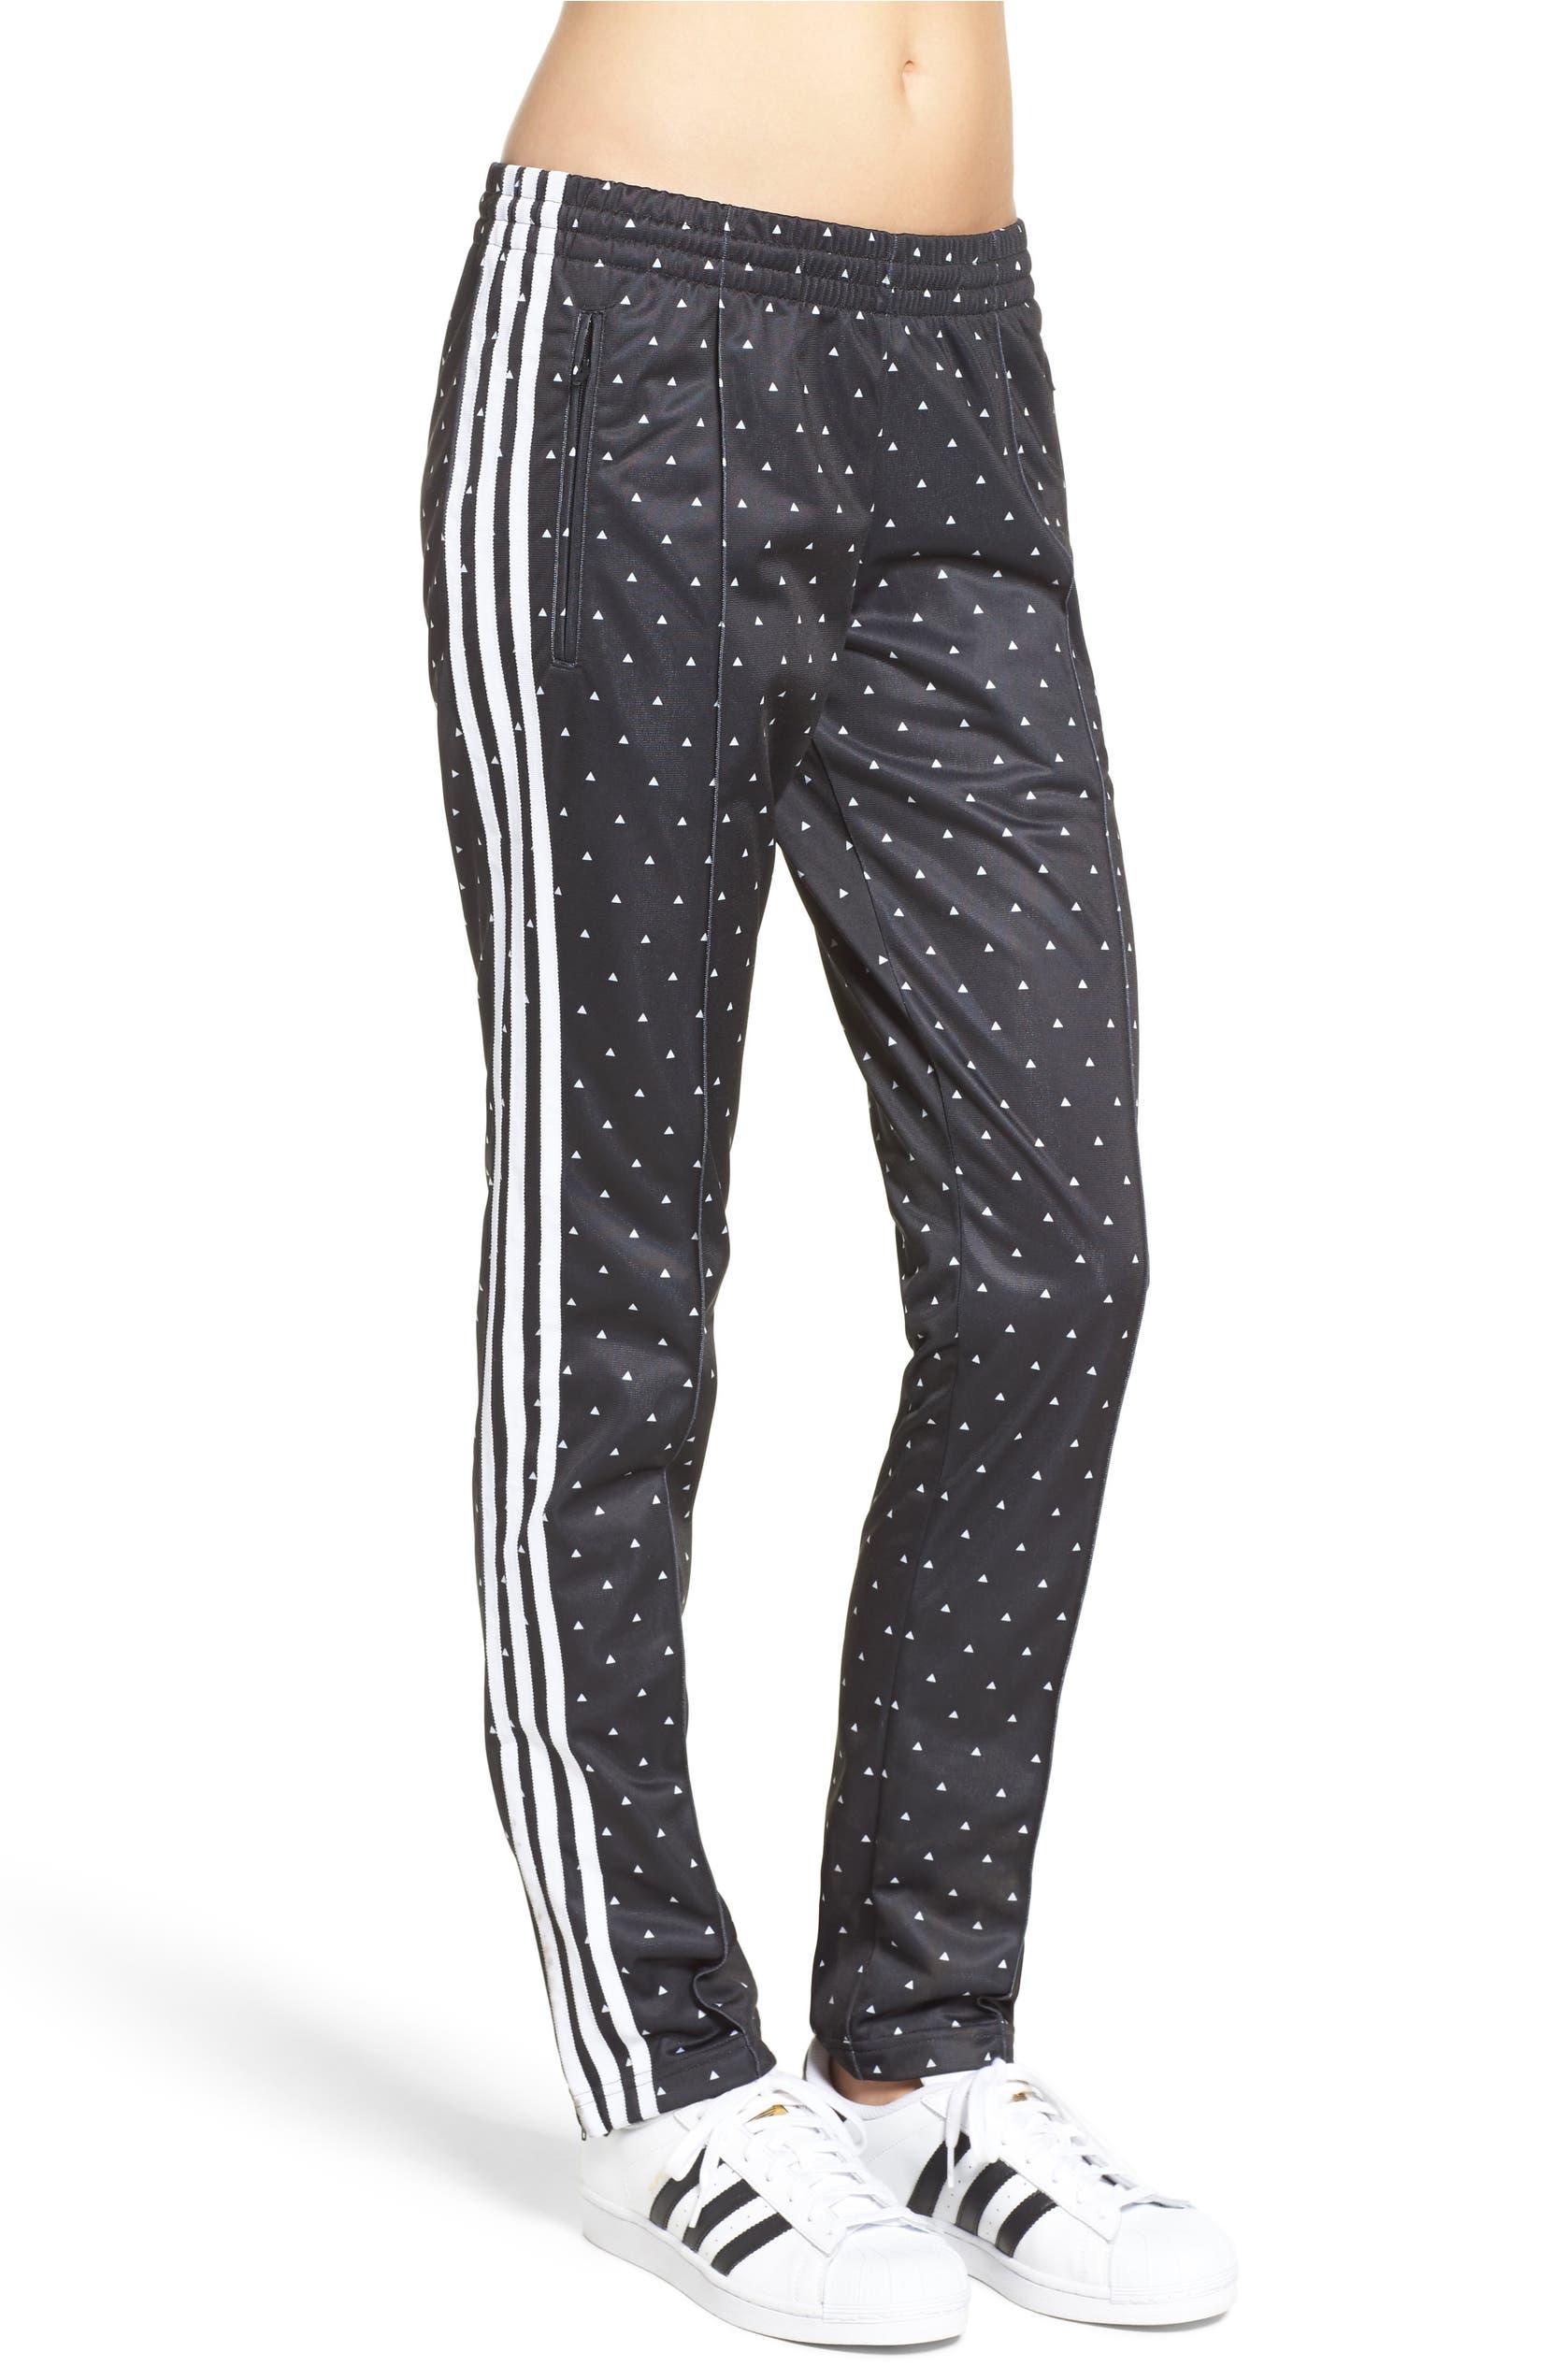 4a993ef52e3 adidas Originals by Pharrell Williams Hu Firebird Track Pants | Nordstrom